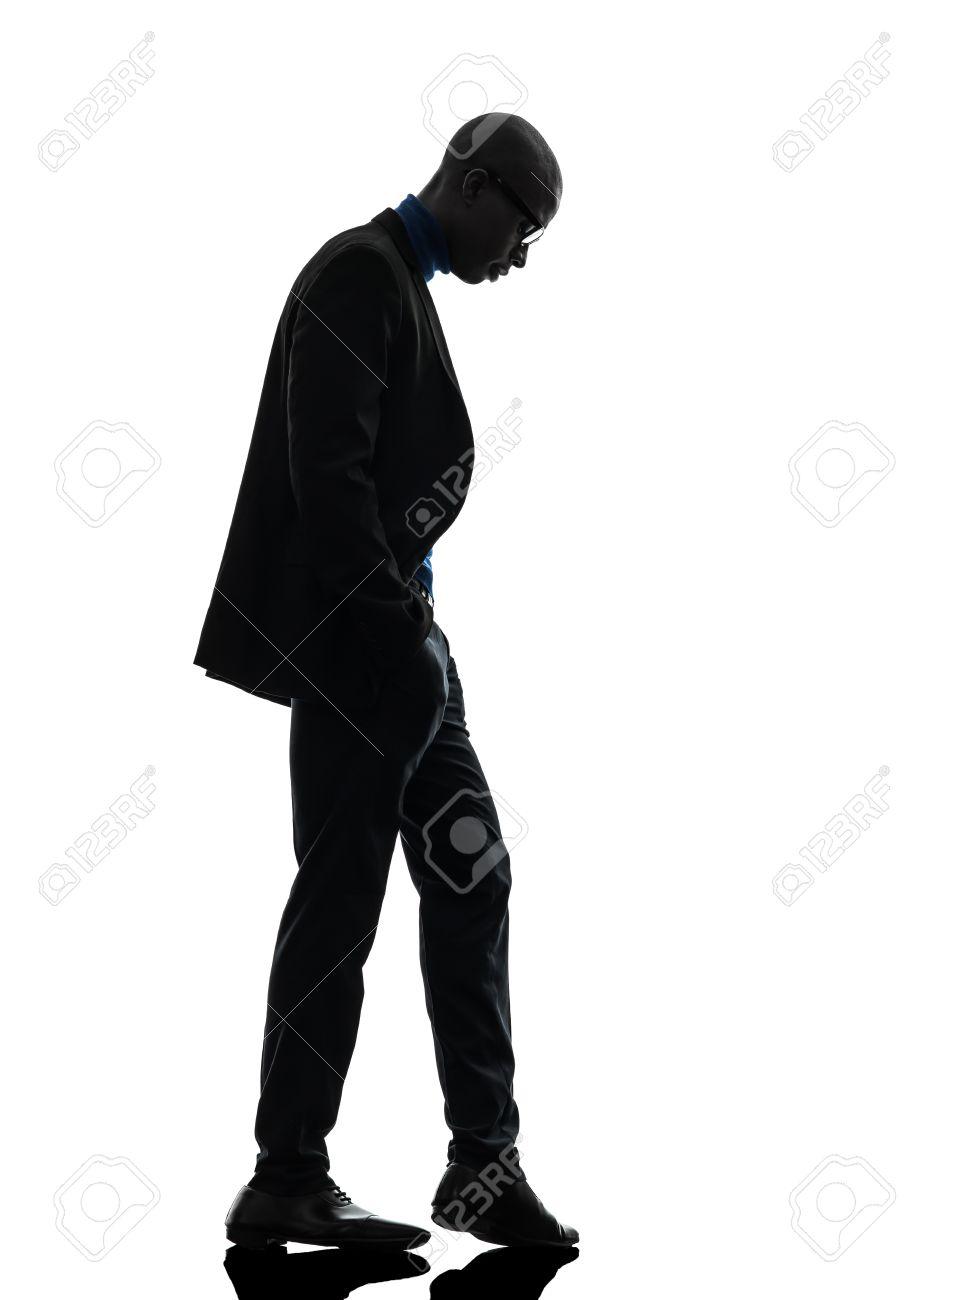 971x1300 One African Black Man Standing Looking Down In Silhouette Studio